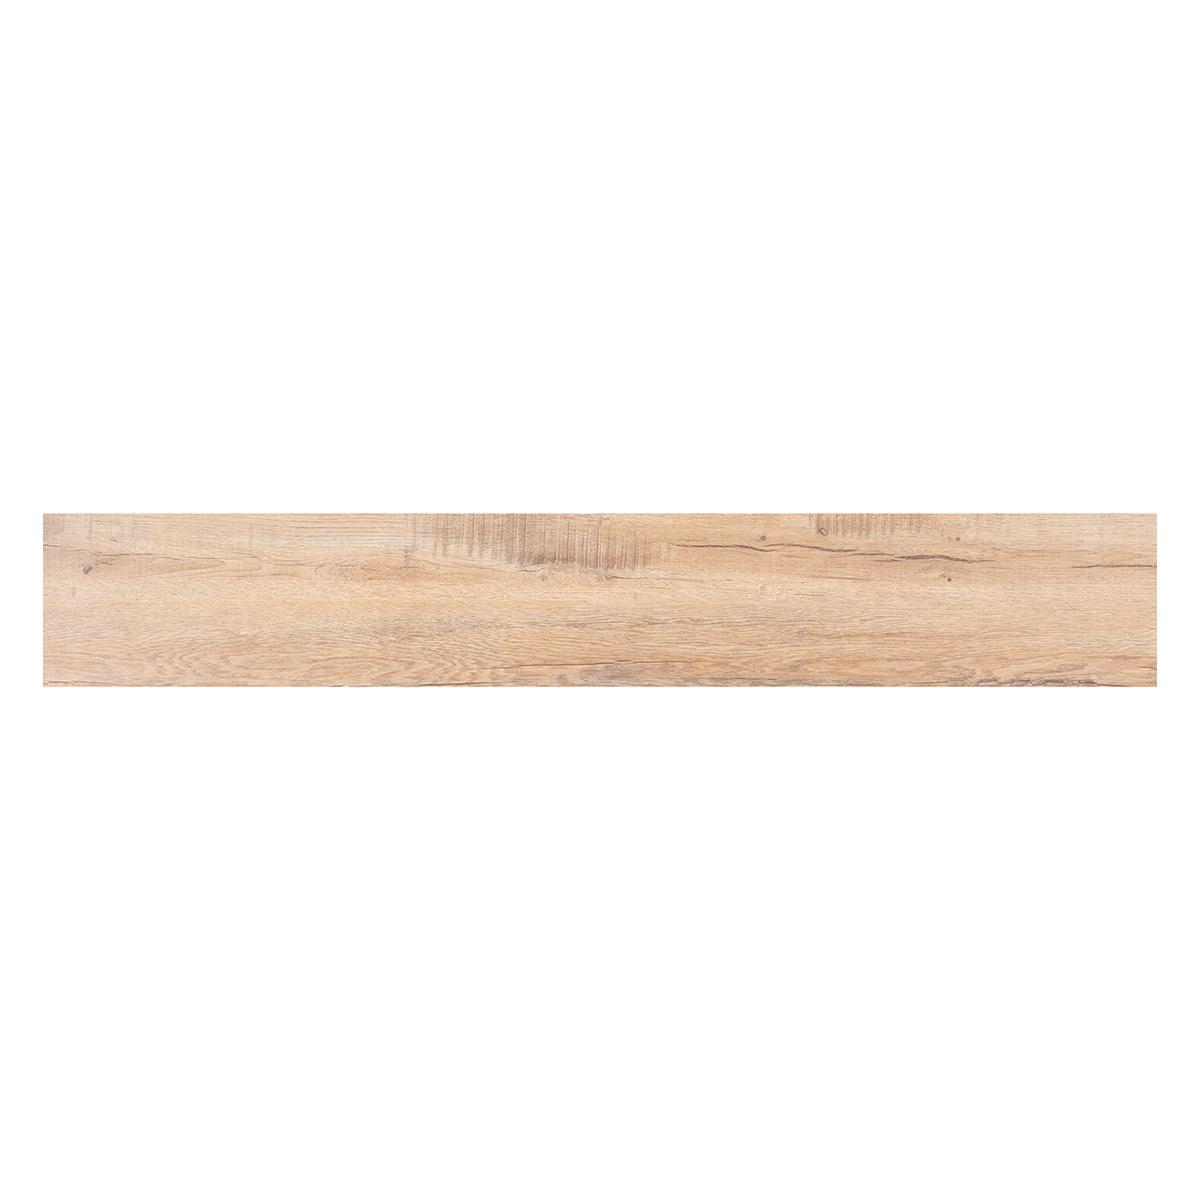 Piso Laminado Country Western Mate - 19.9X121.5 - 2.90 m2